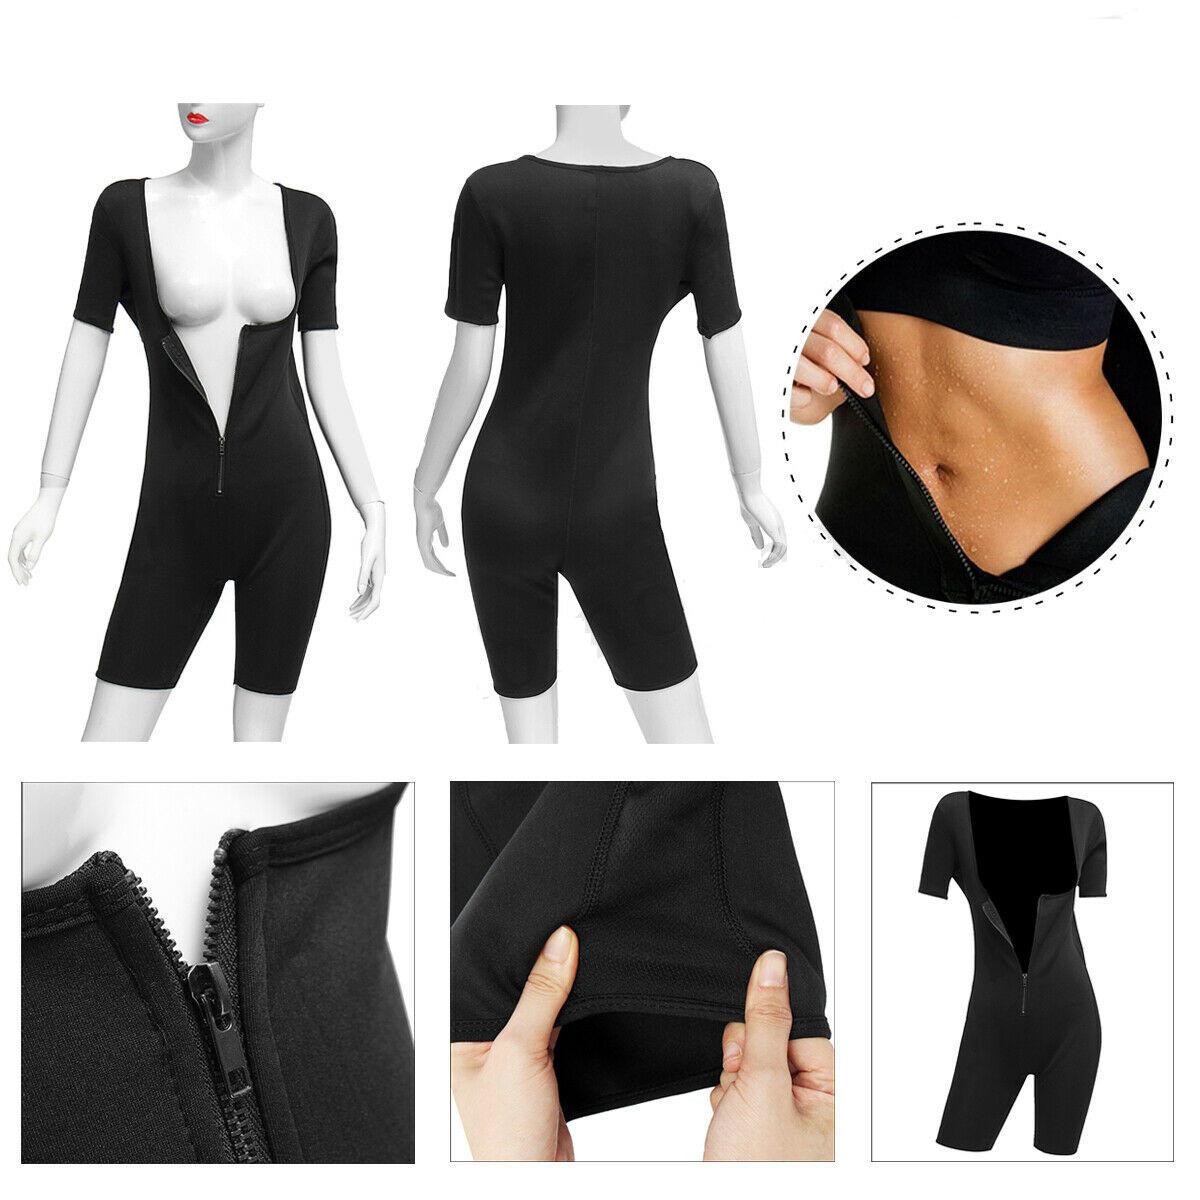 Womens Shapewear Full Body Sweat Shaper Slimming Fitness Gym Sport Sauna Suit Vest